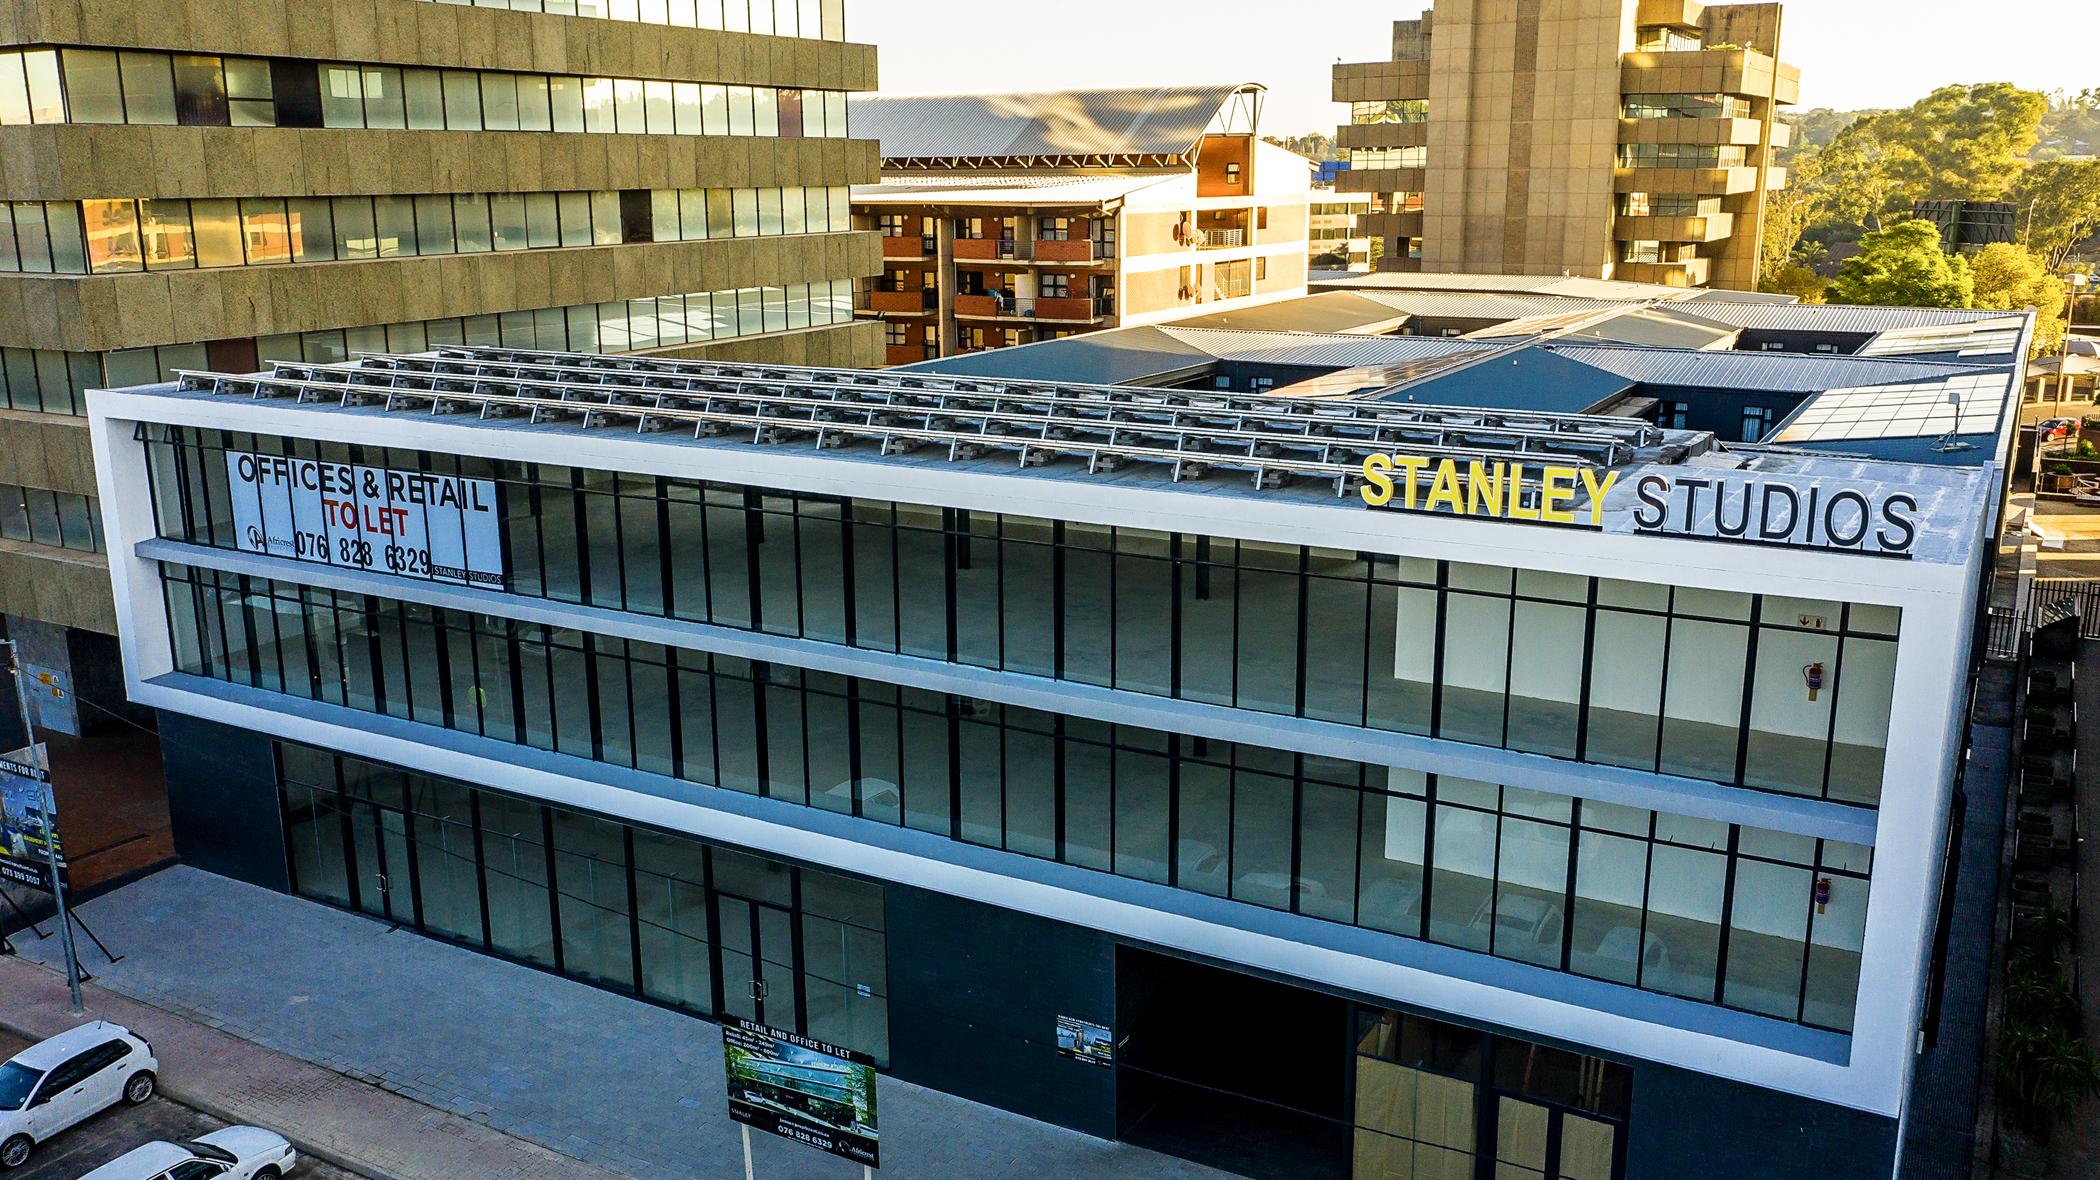 StanleyStudiosAFC006